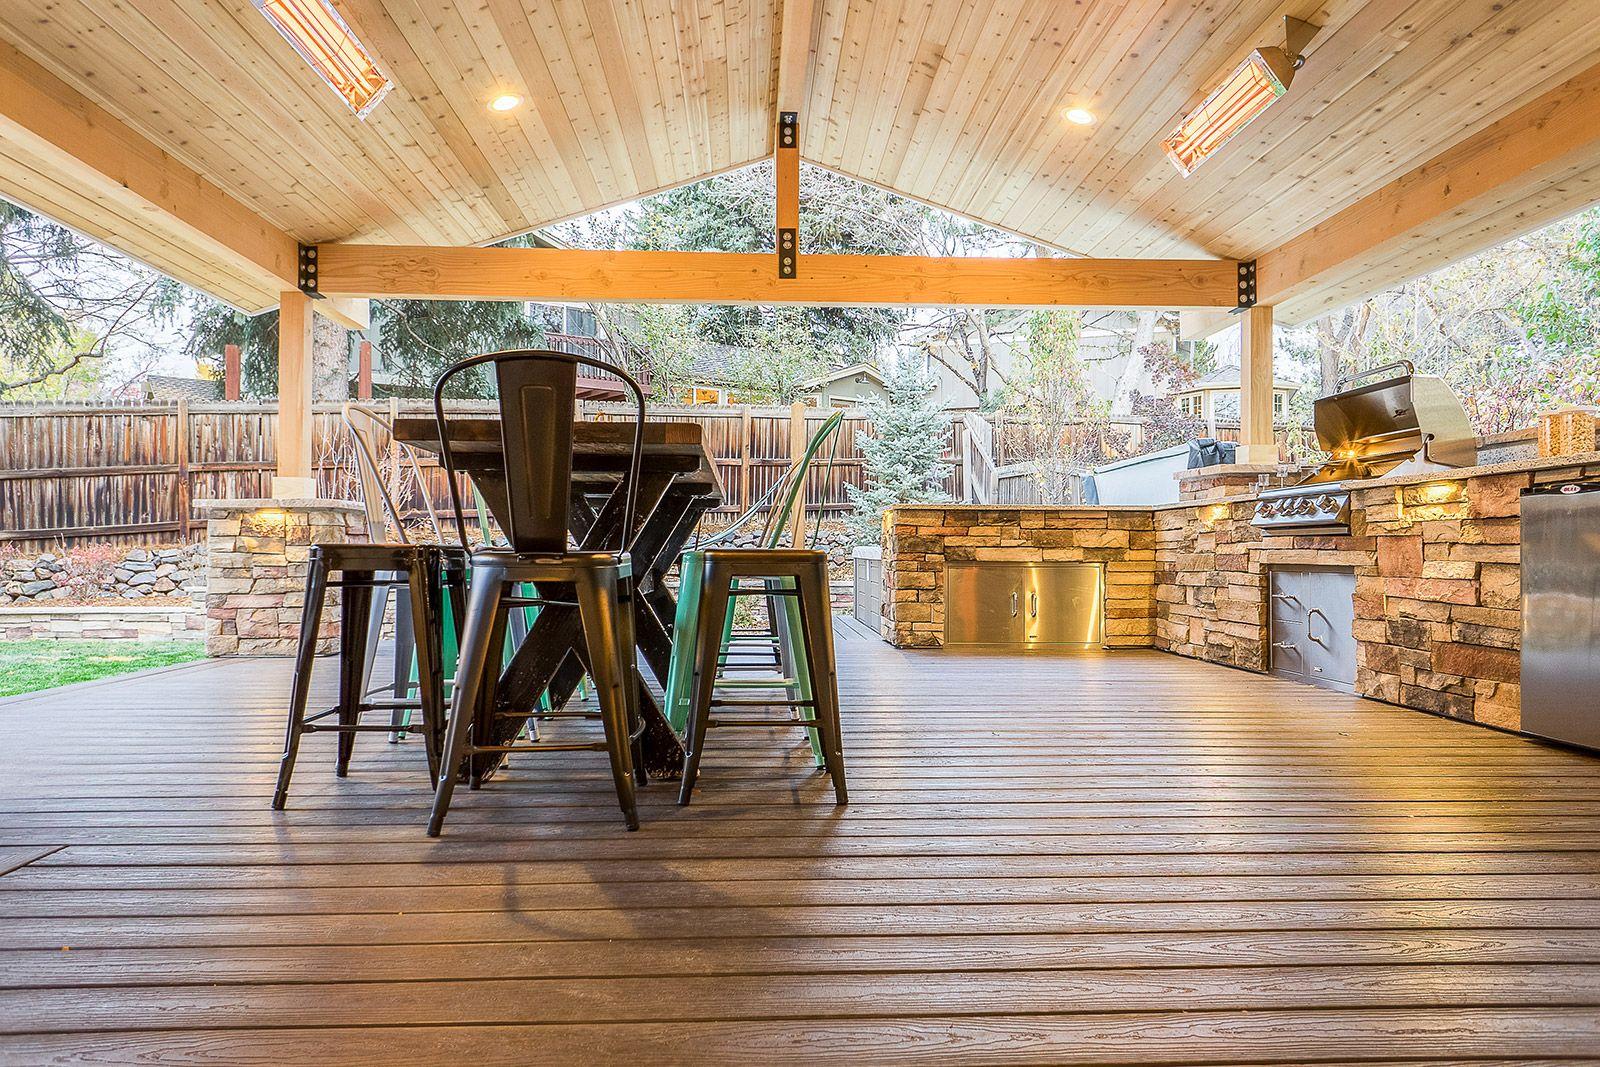 Outdoor-Living-OL1 - Elite Landscape & Outdoor Living ... on Elite Landscape And Outdoor Living id=51939